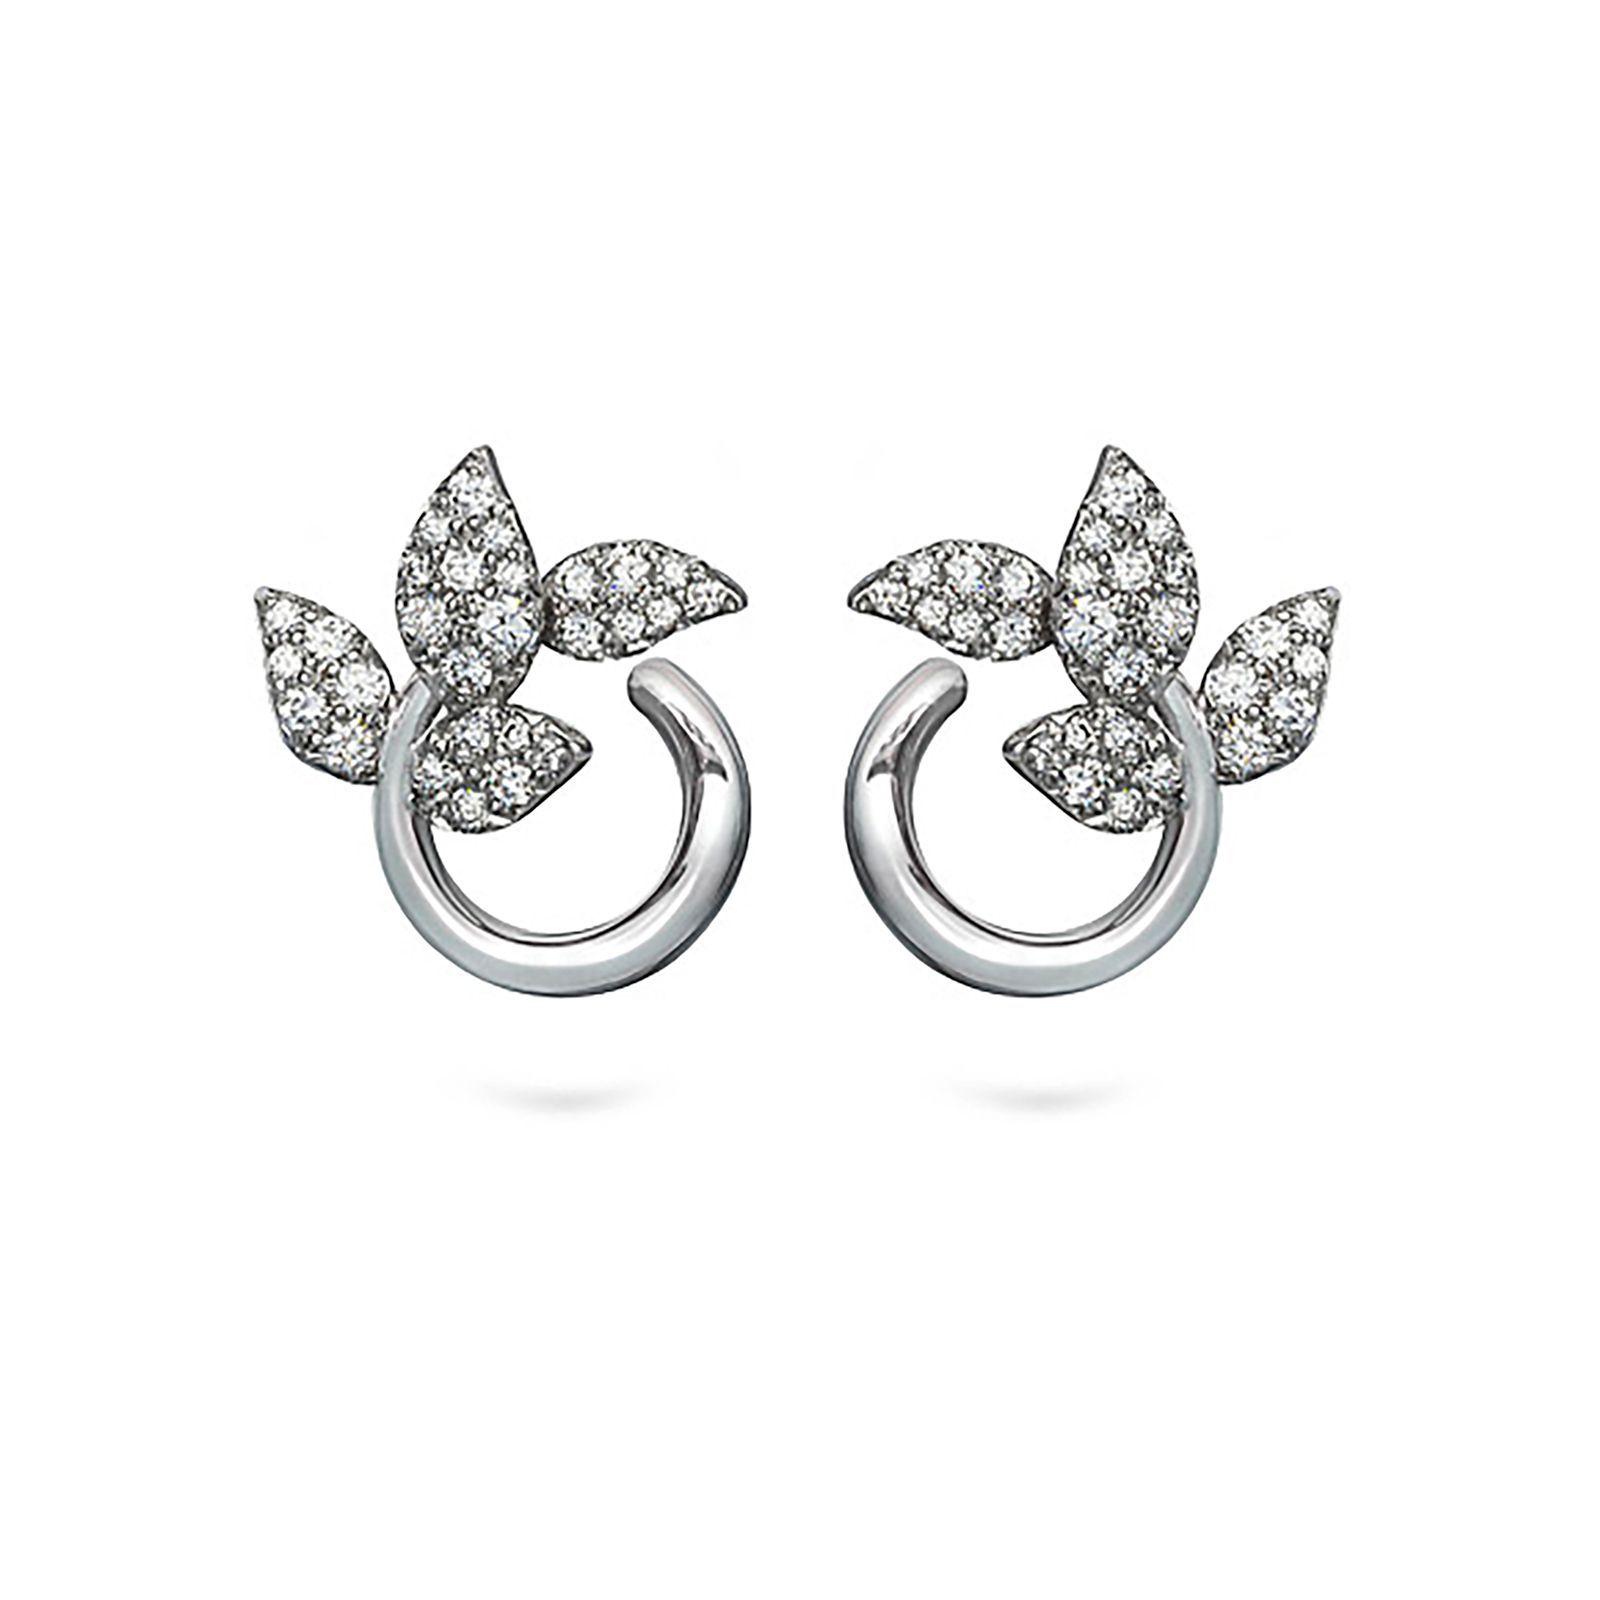 Diana Vincent Leaf Diamond Earrings